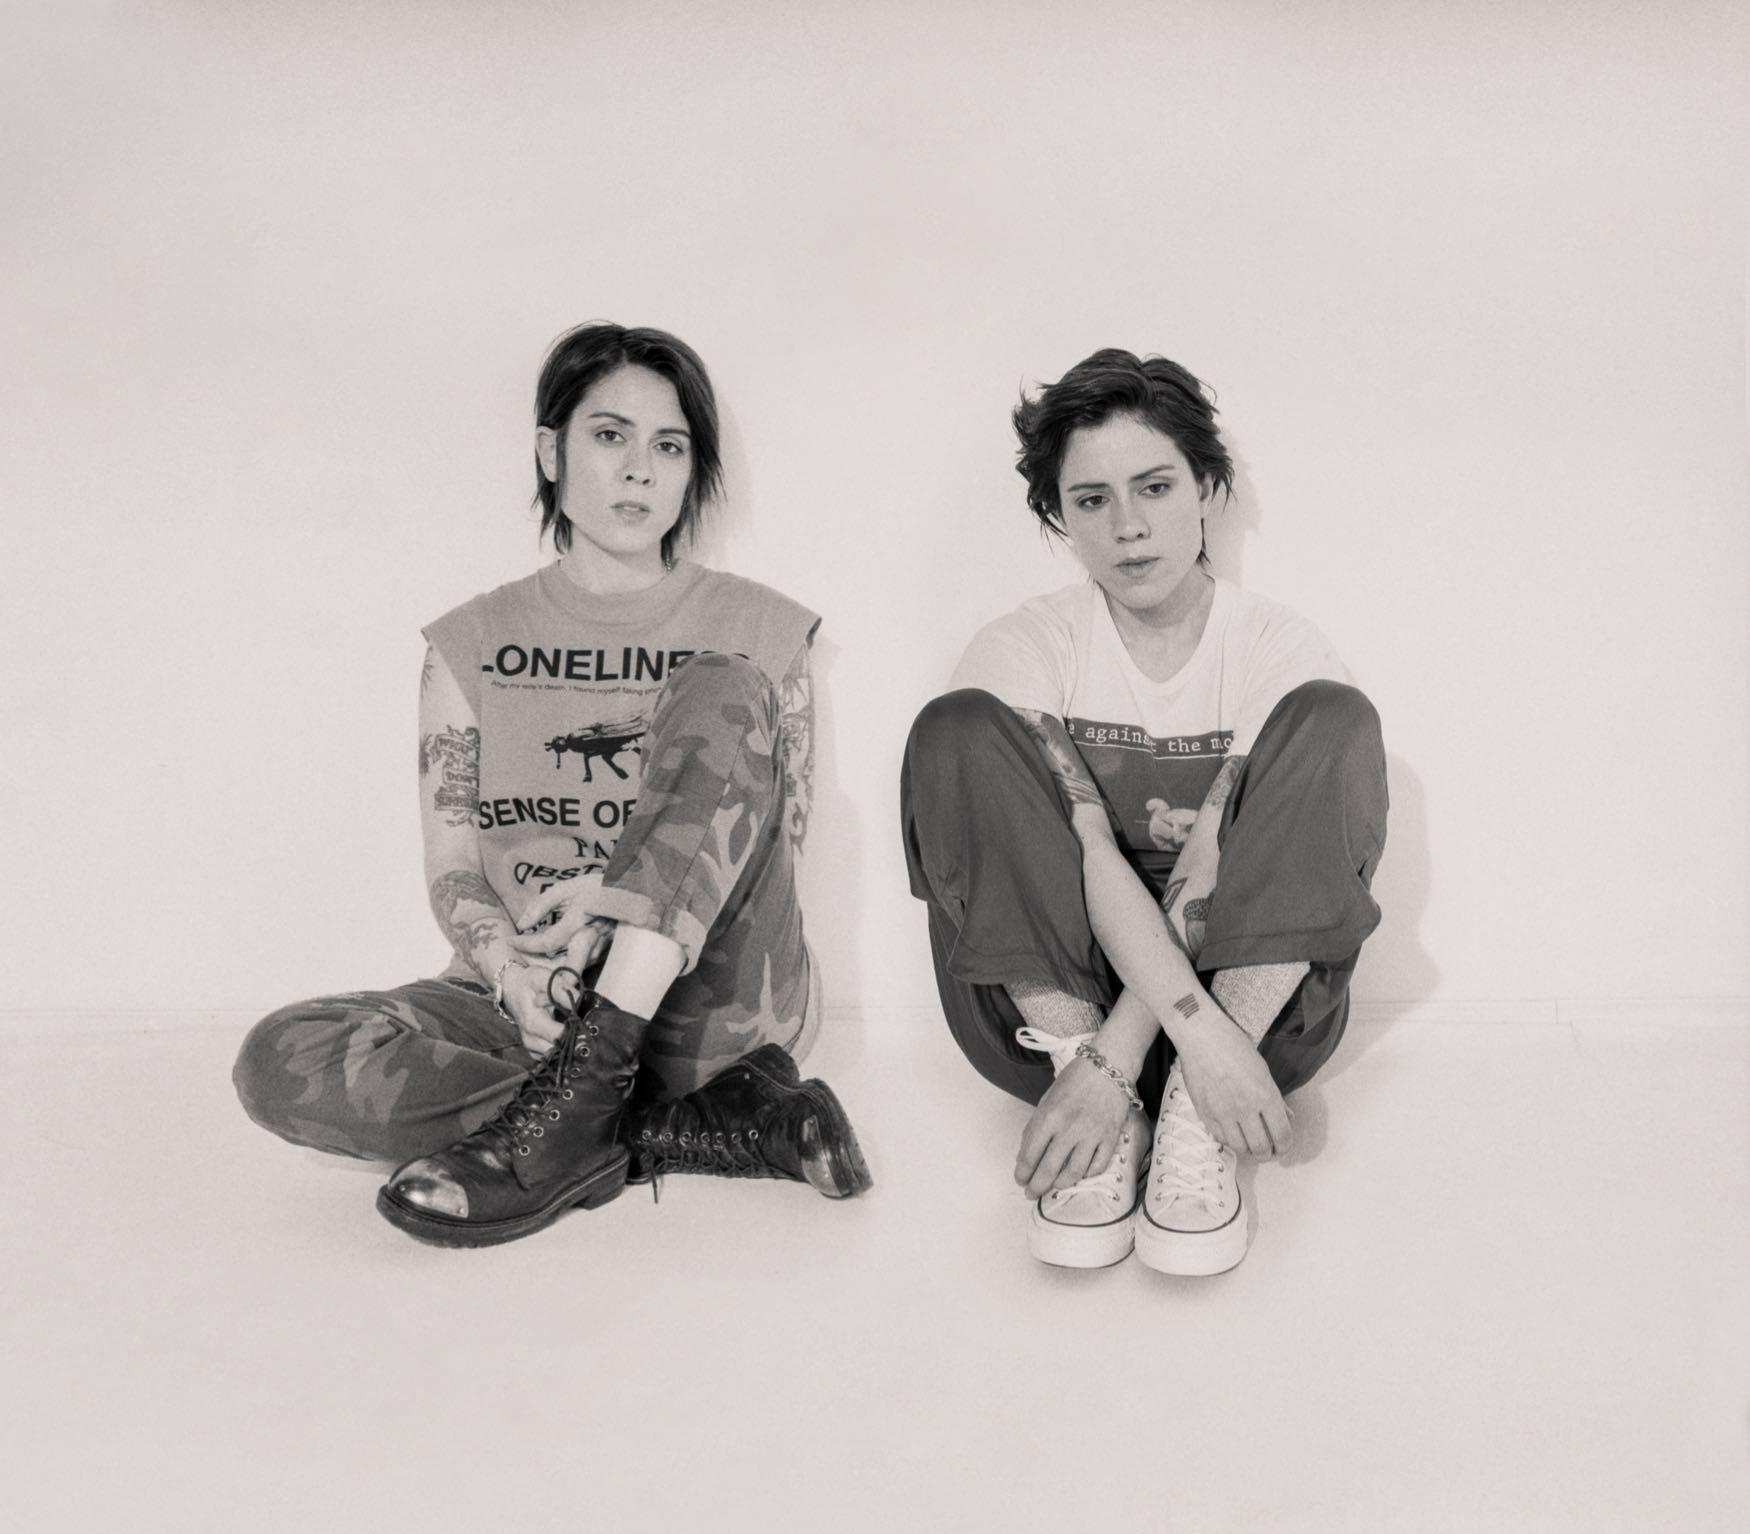 Tegan and Sara. Photo by Trevor Brady. Courtesy of Warner Records. Used with permission.